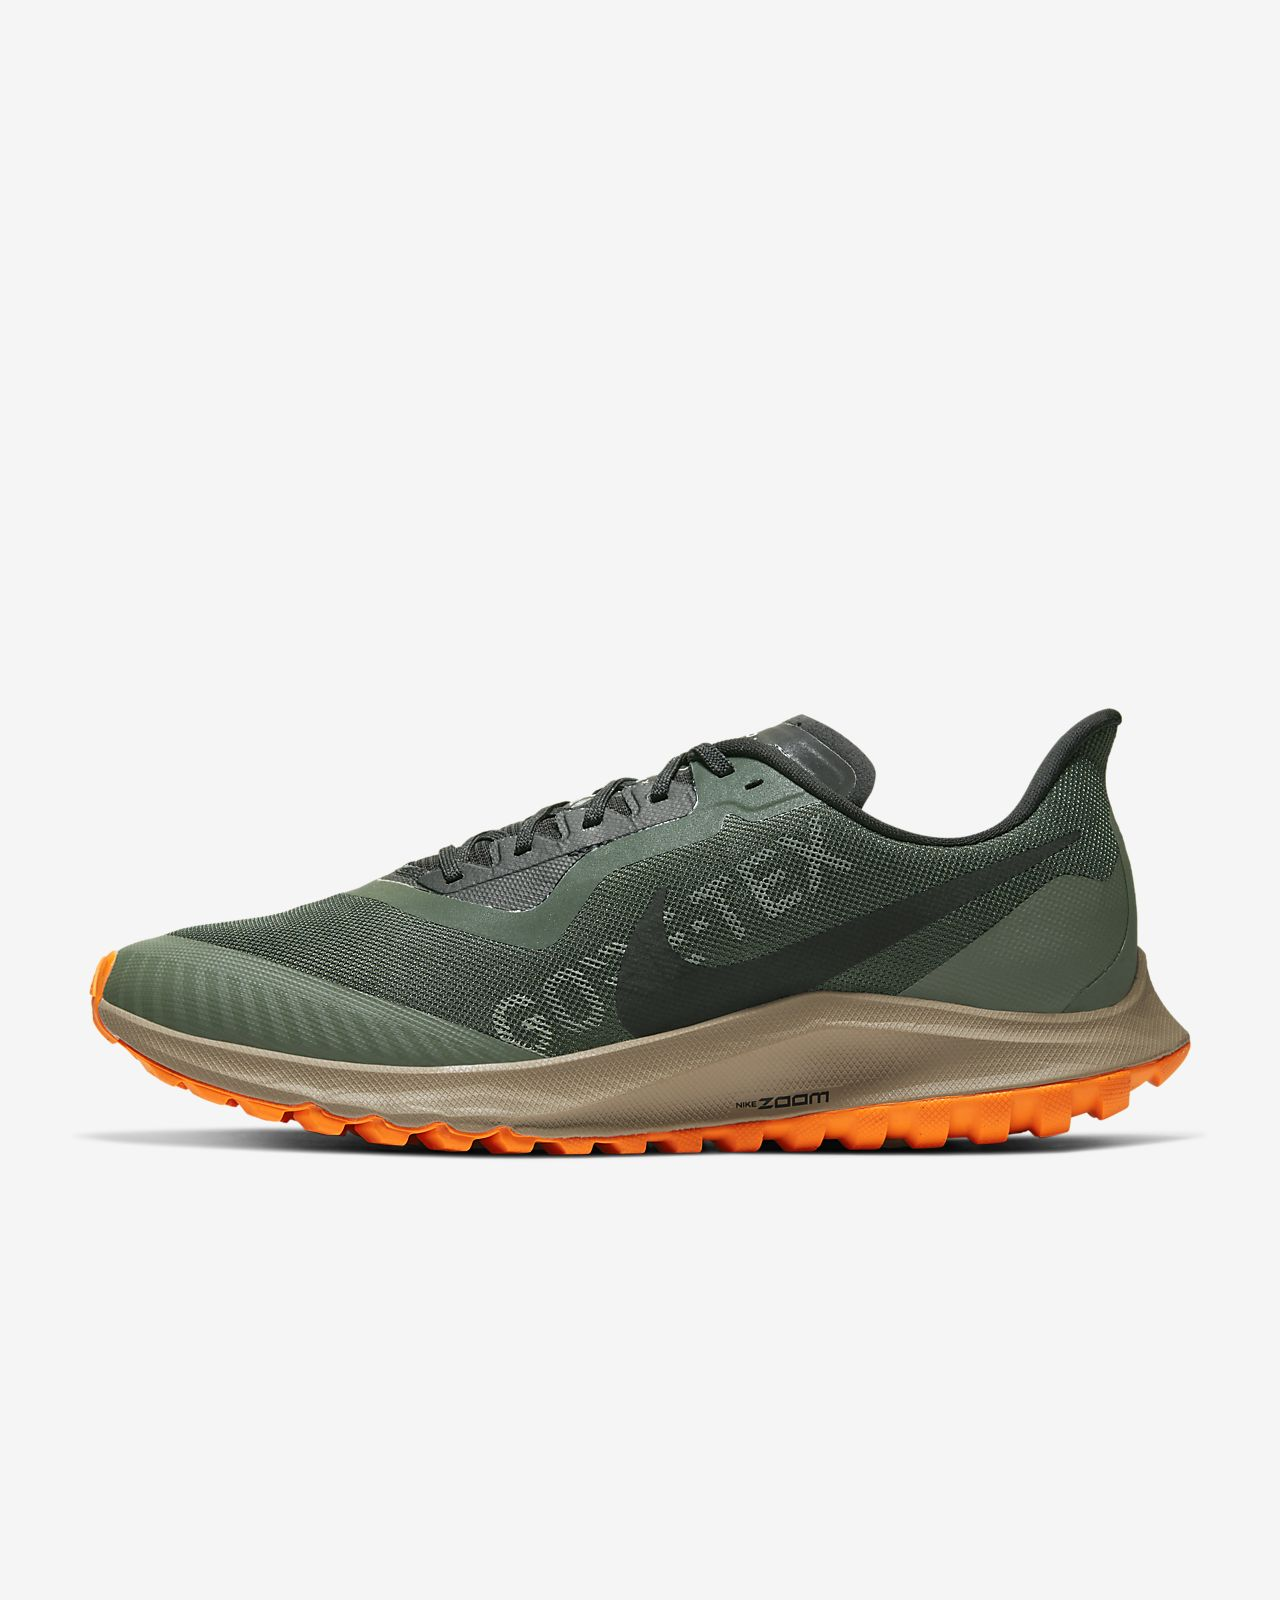 Nike Zoom Pegasus 36 Trail GORE-TEX® Sabatilles de trail running - Home